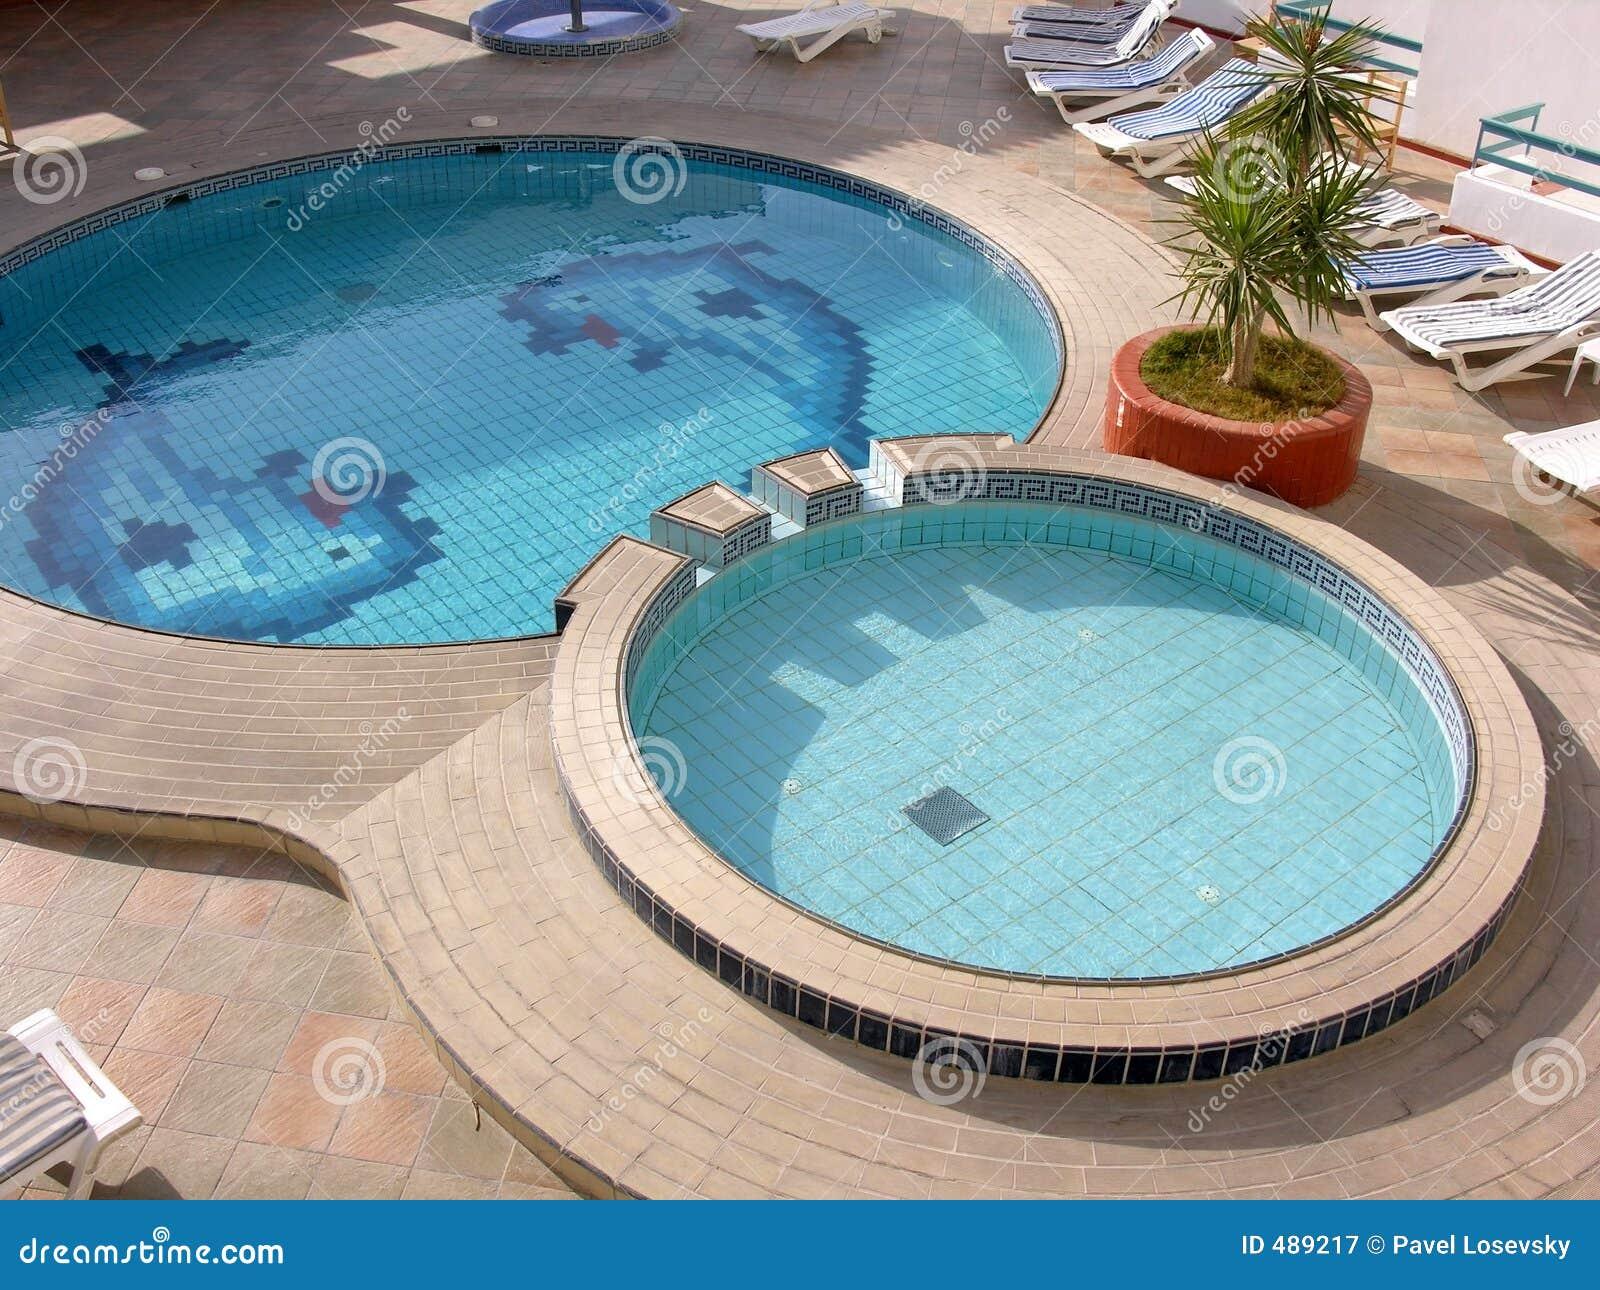 Water pool in hotel